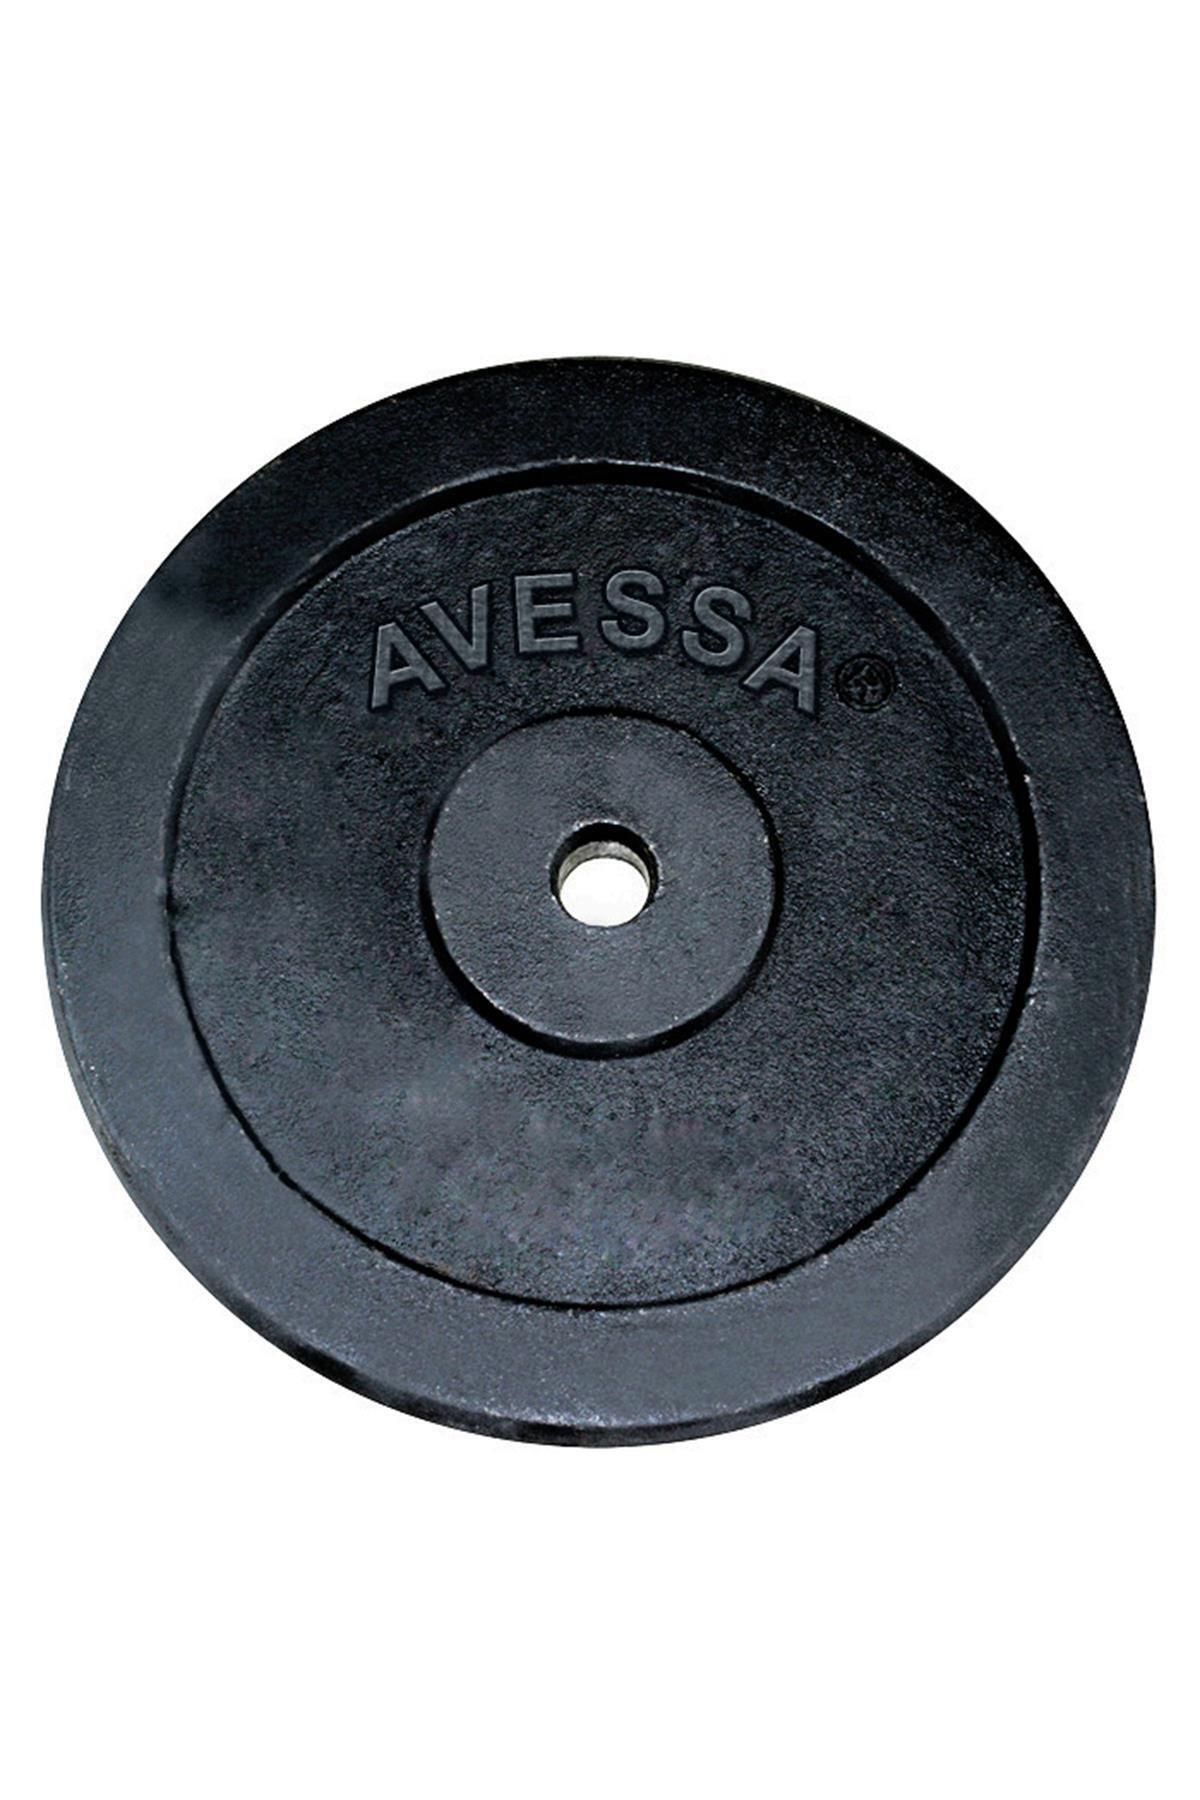 AVESSA 1 kg Siyah Döküm Plaka 2